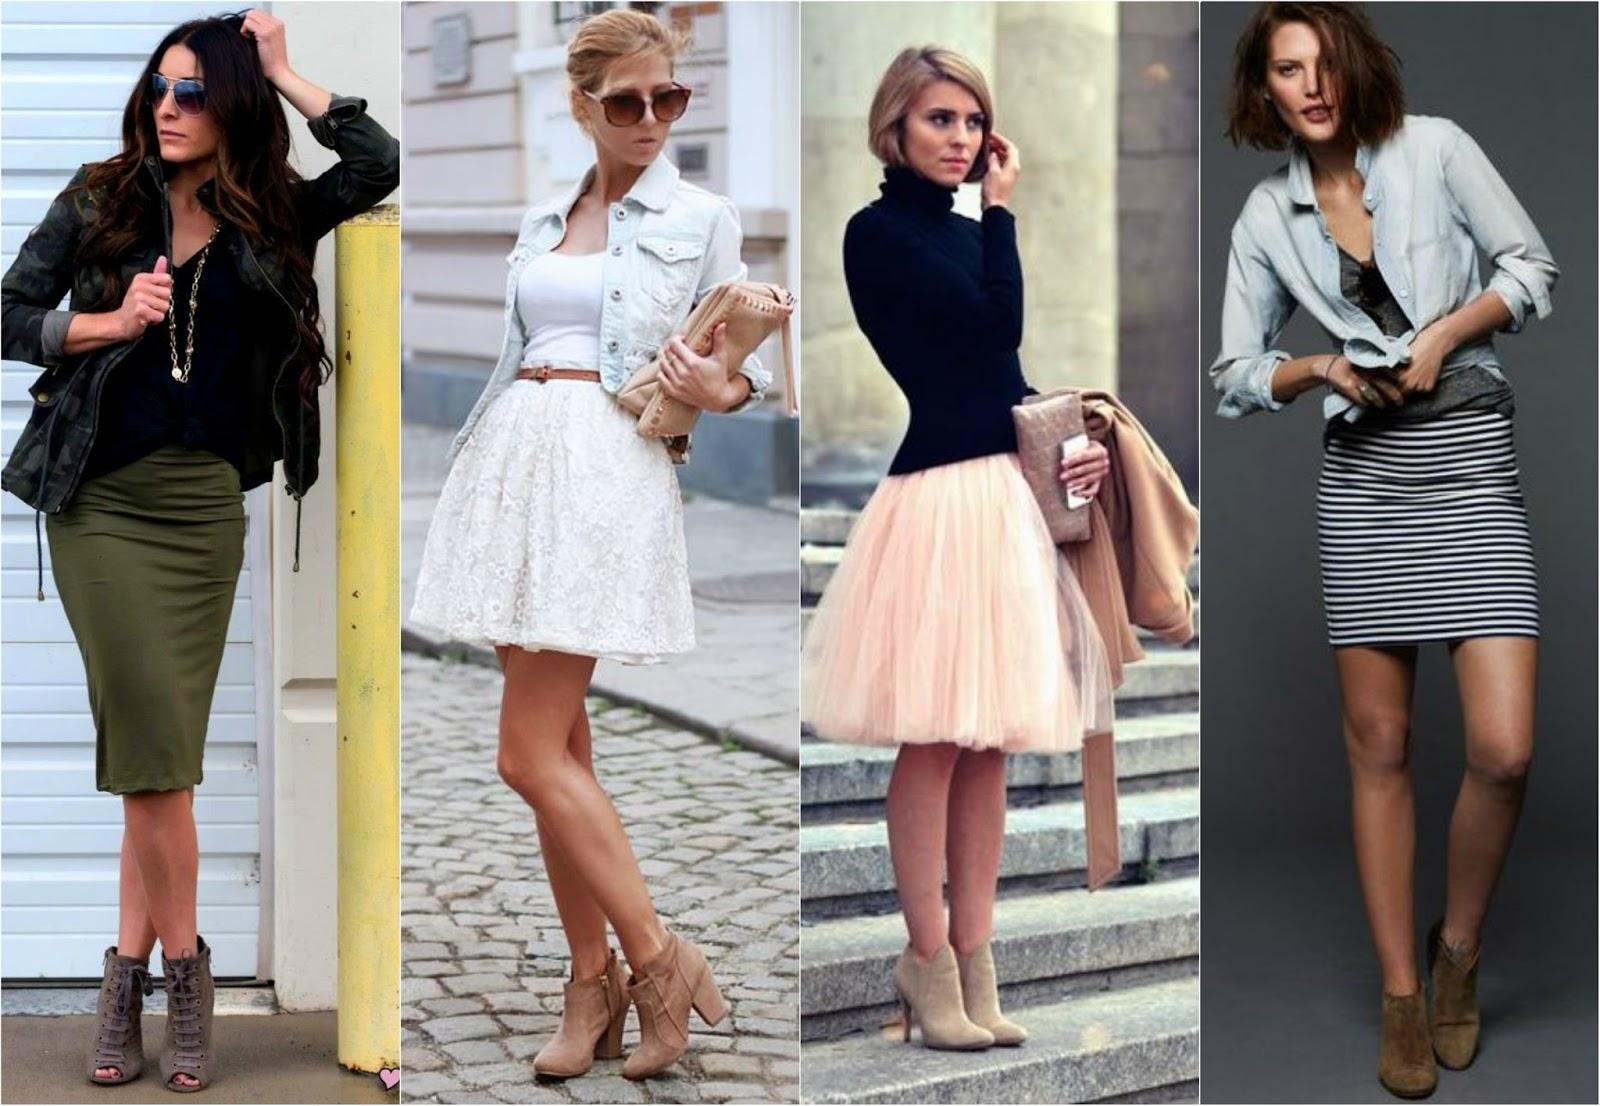 Heath tanya interchangeable heels, Stylish dps for fb